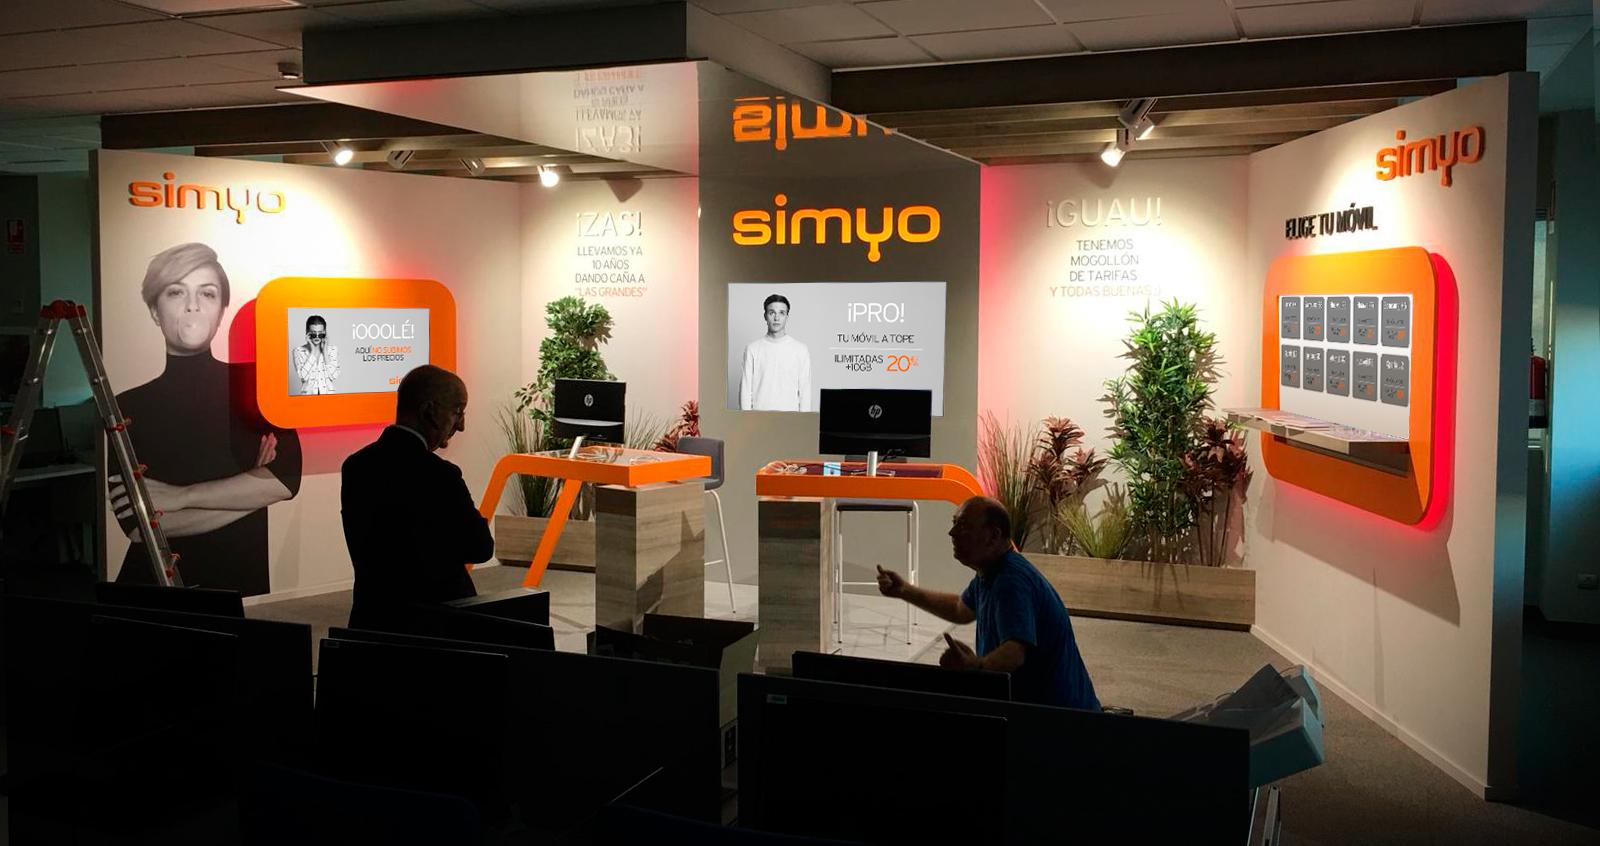 Simyo tienda virtual metric3 for Oficinas simyo